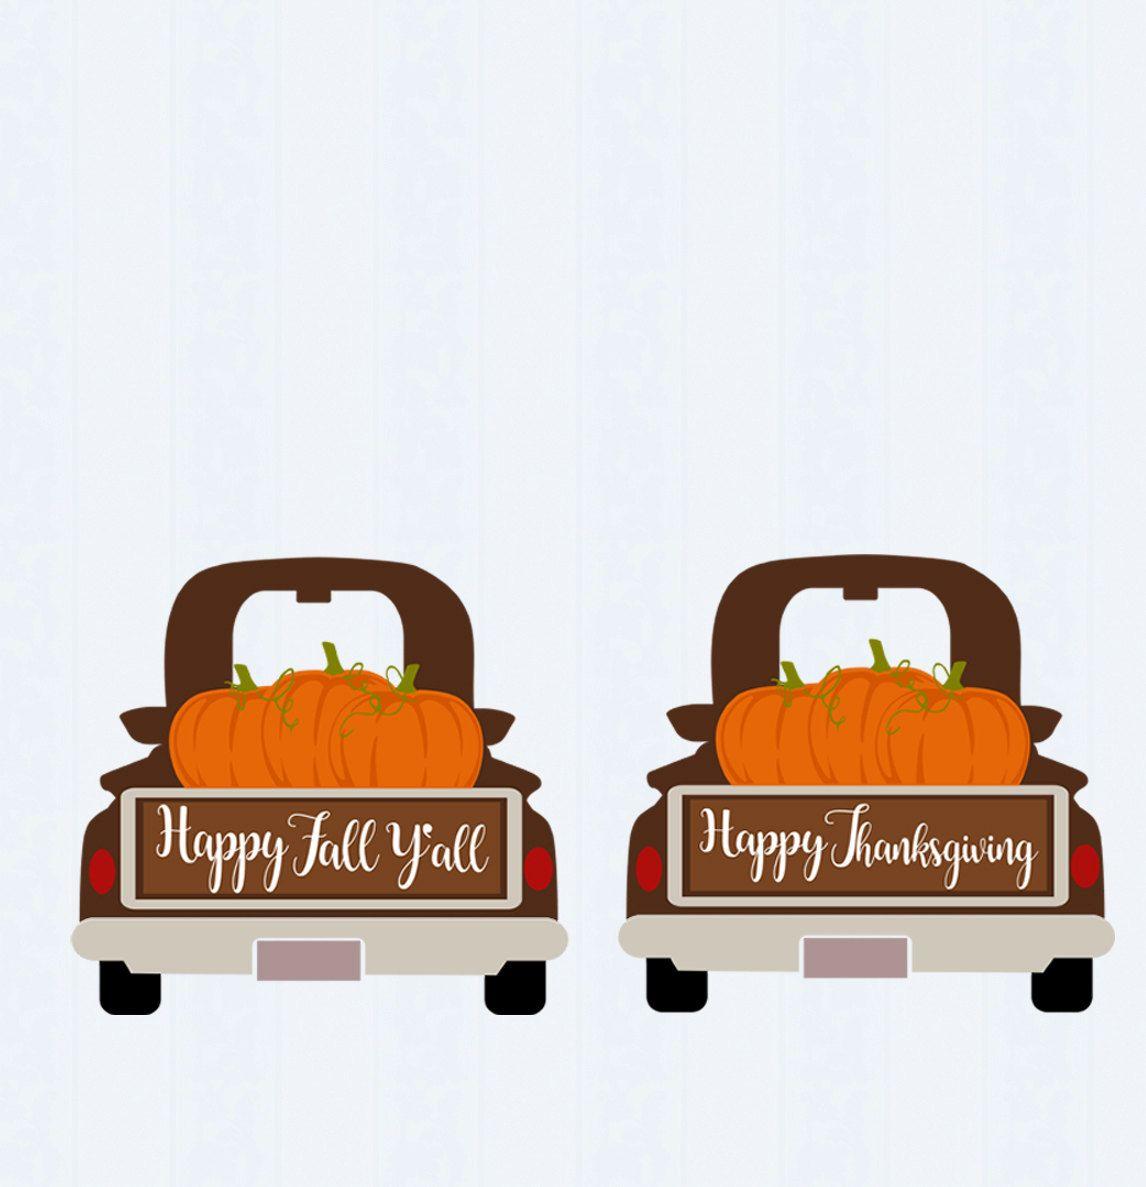 autumn Red Truck svg png jpg eps dxf pdf Vintage Truck Happy Fall Yall Fall Pumpkin Truck SVG thanksgiving clipart pumpkins